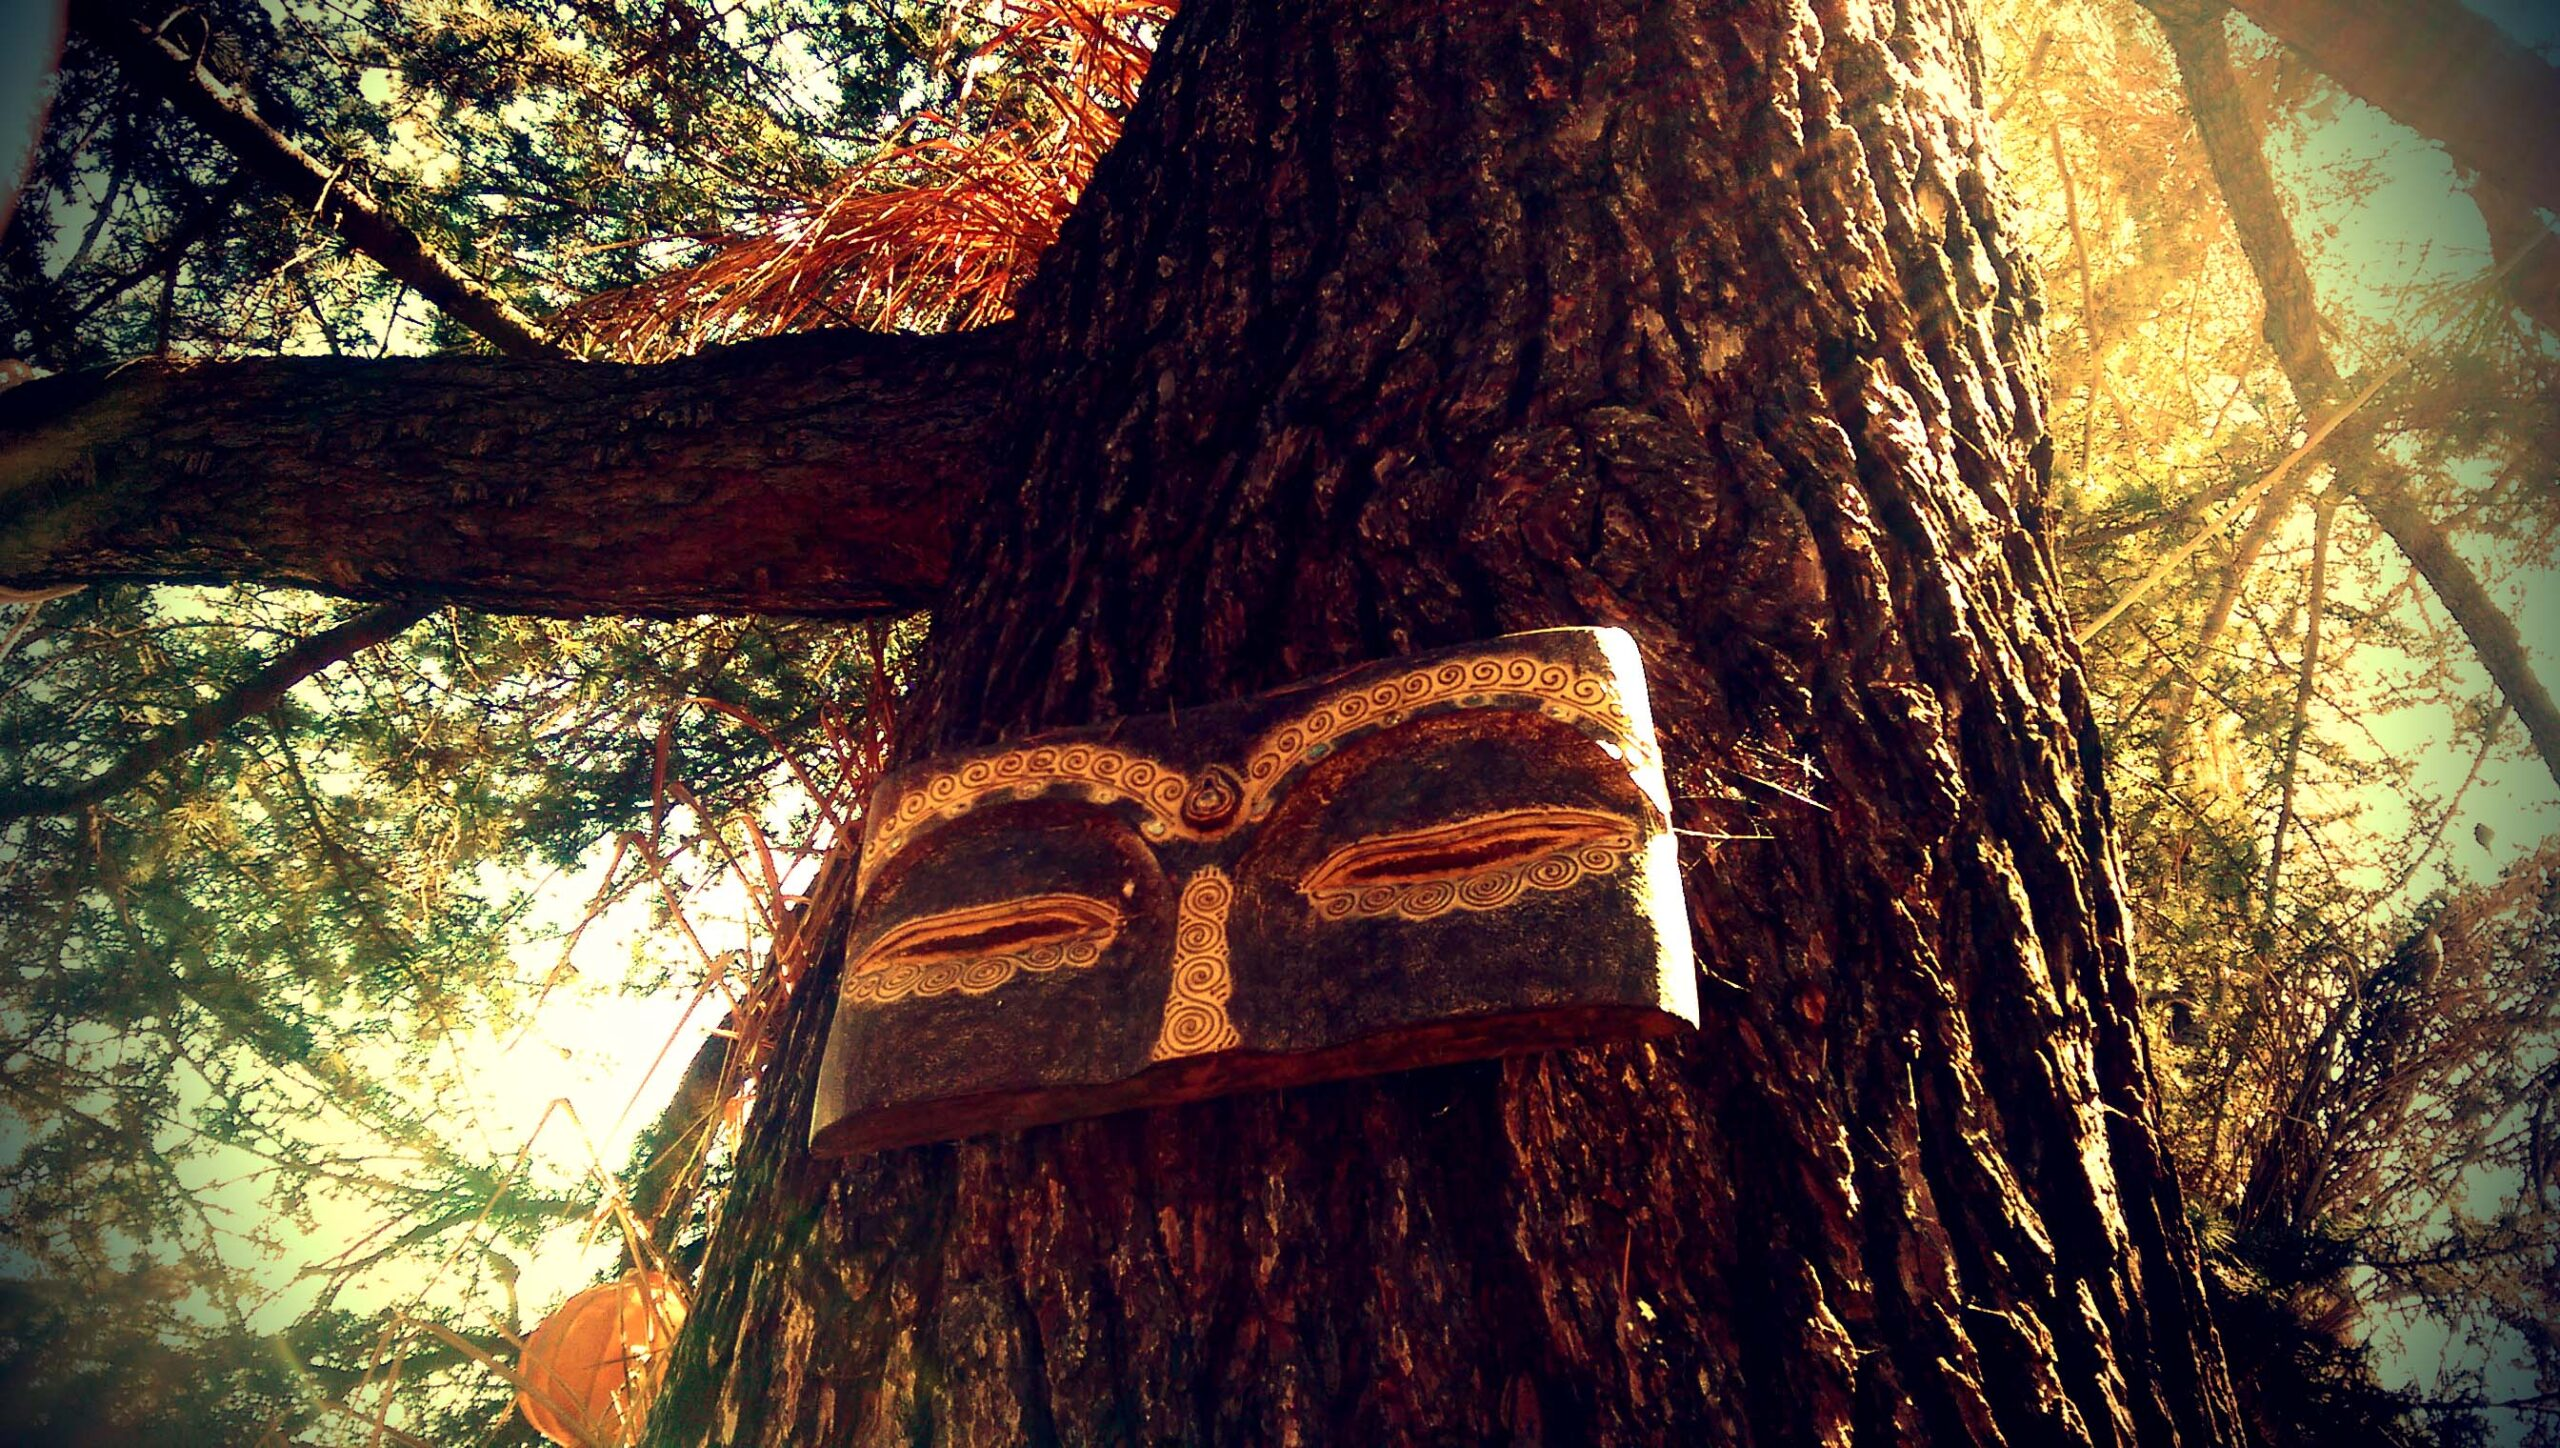 Tree with meditative mask